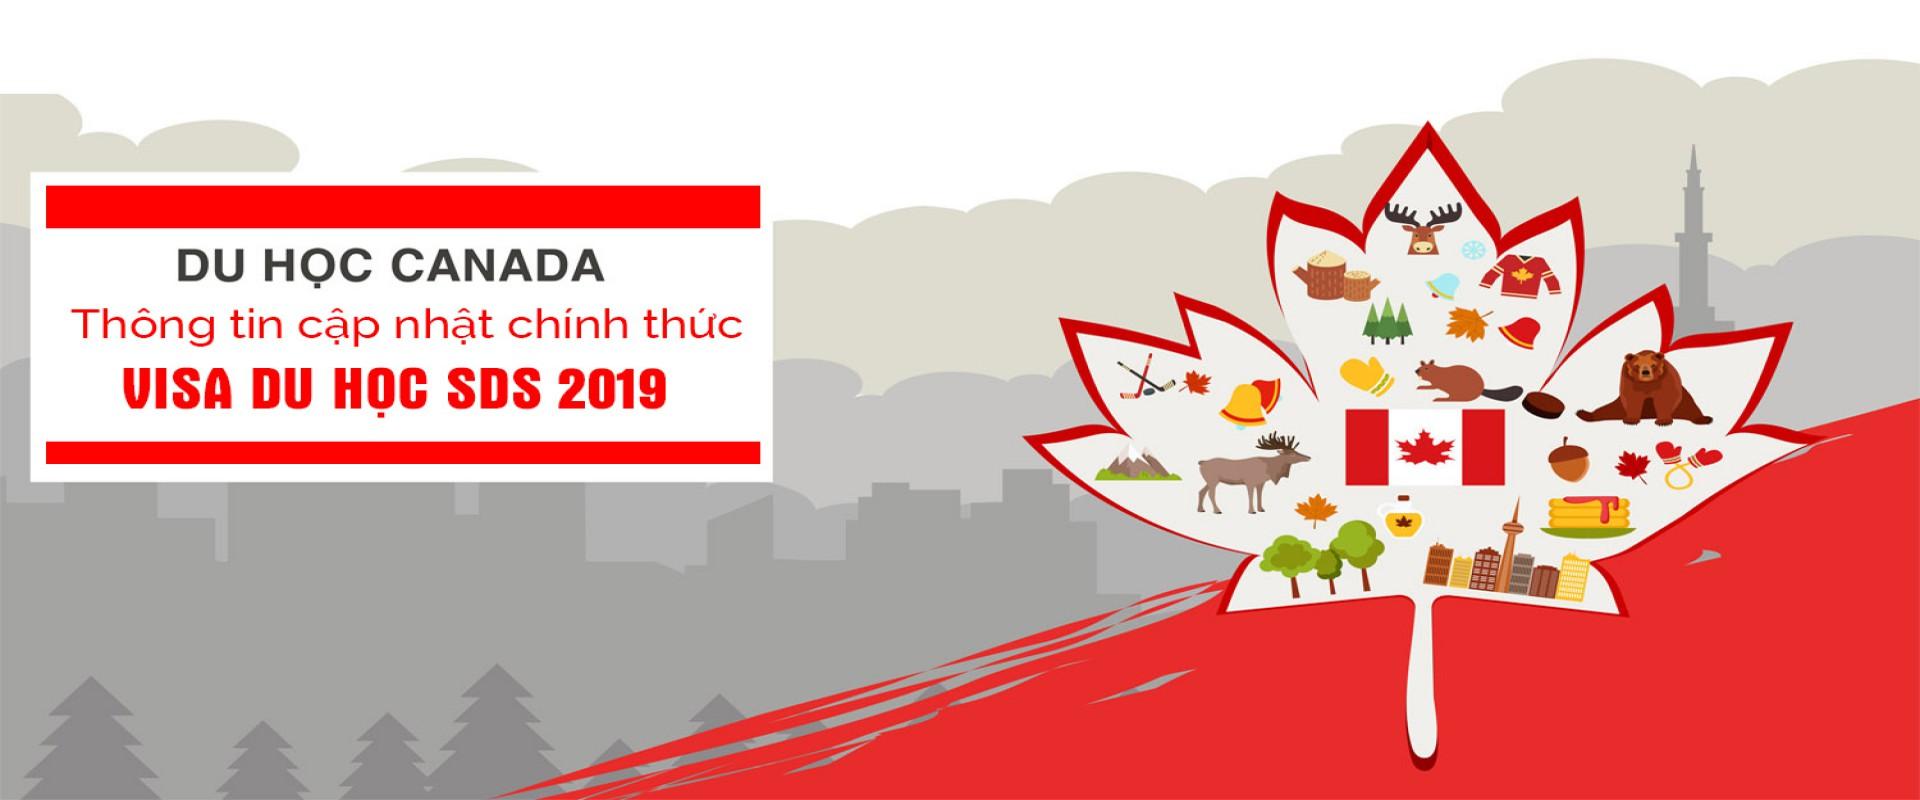 Cập nhật Visa SDS du học Canada